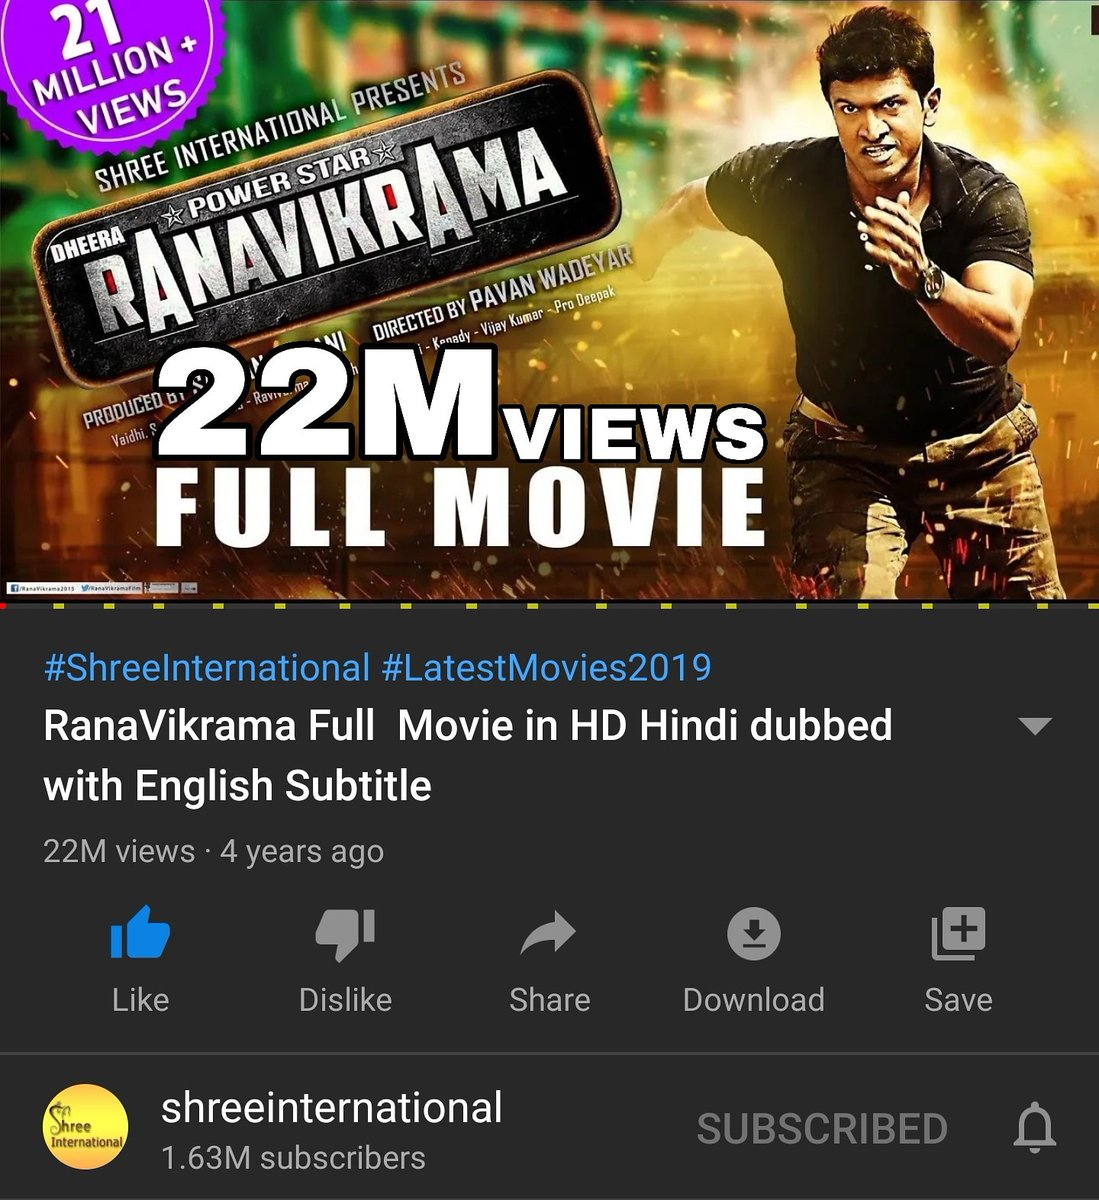 #Ranavikrama Hindu Dubbed movie #22 Million View's COMPLETED #DrRajkumar #Rajkumar #Annavaru #Appu #AppuBoss #PRK #PuneethRajkumar  #BossOfSandalwoodShivaRajkumar   #ShivaRajkumar #Shivanna   #RaghavendraRajkumar #YuvaRajkumar #VinayRajkumar  #yuvarathnaa